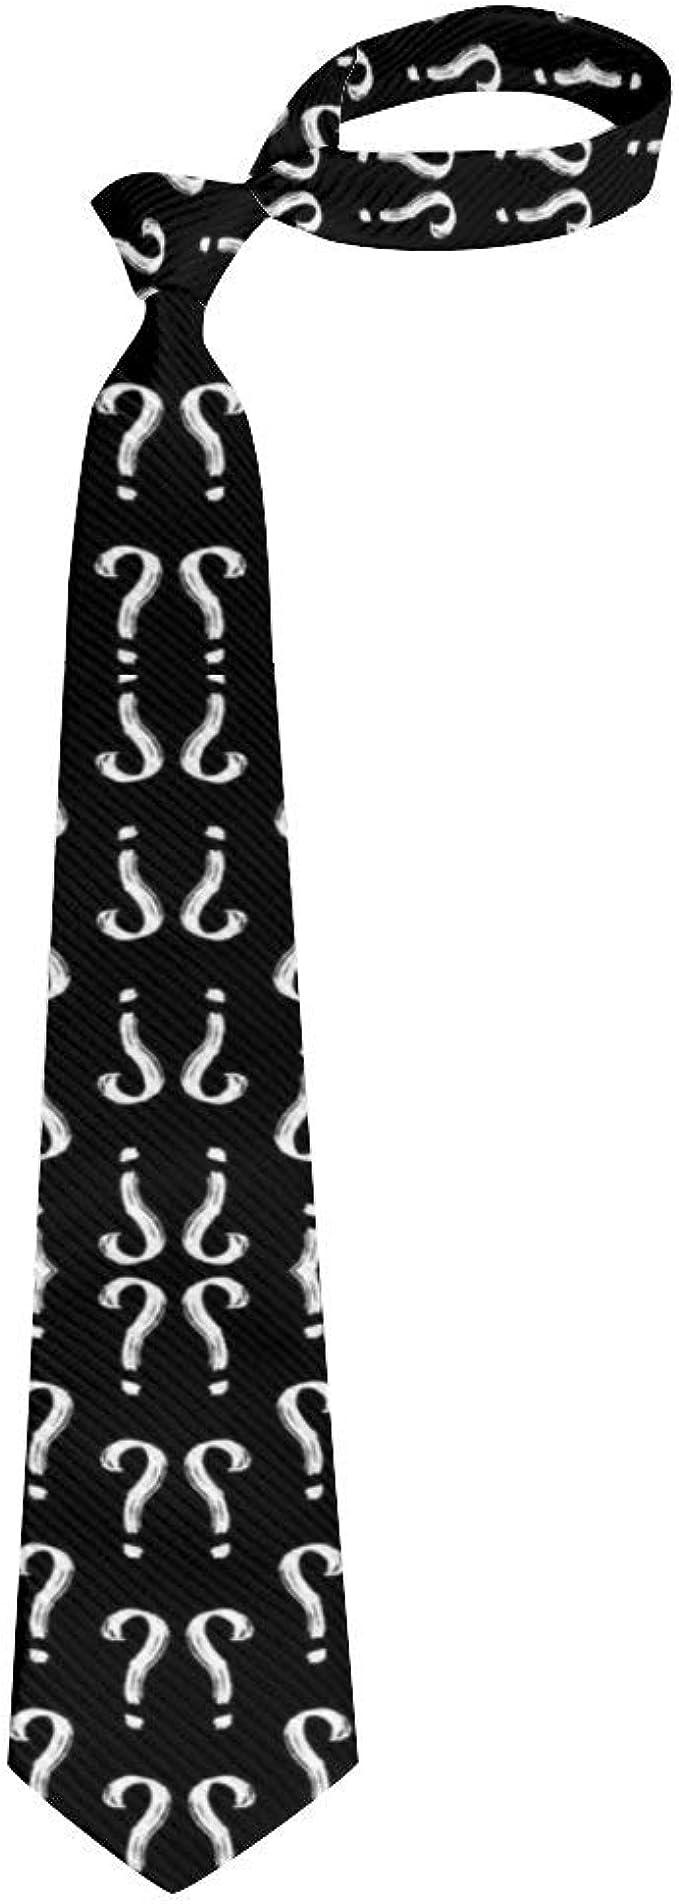 Boys Fashion 3D Printed Mens Ties Teens Neckties Gift for Men